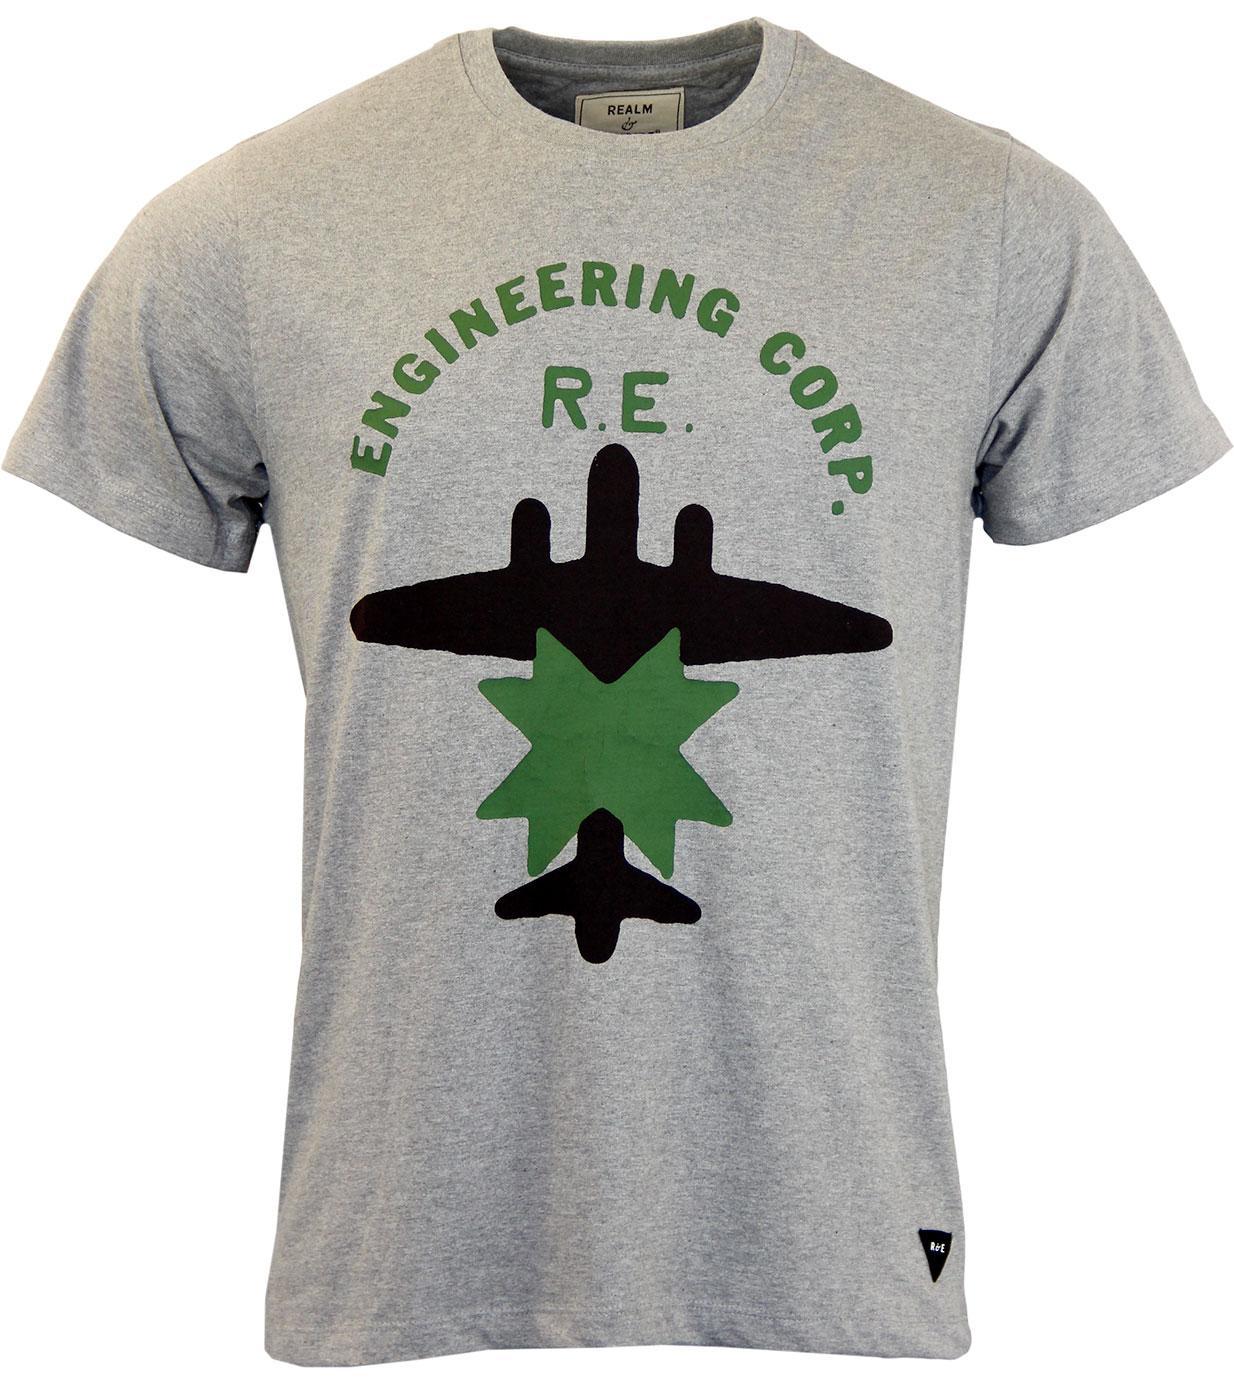 REALM & EMPIRE Retro WWII Engineering Corps Tee